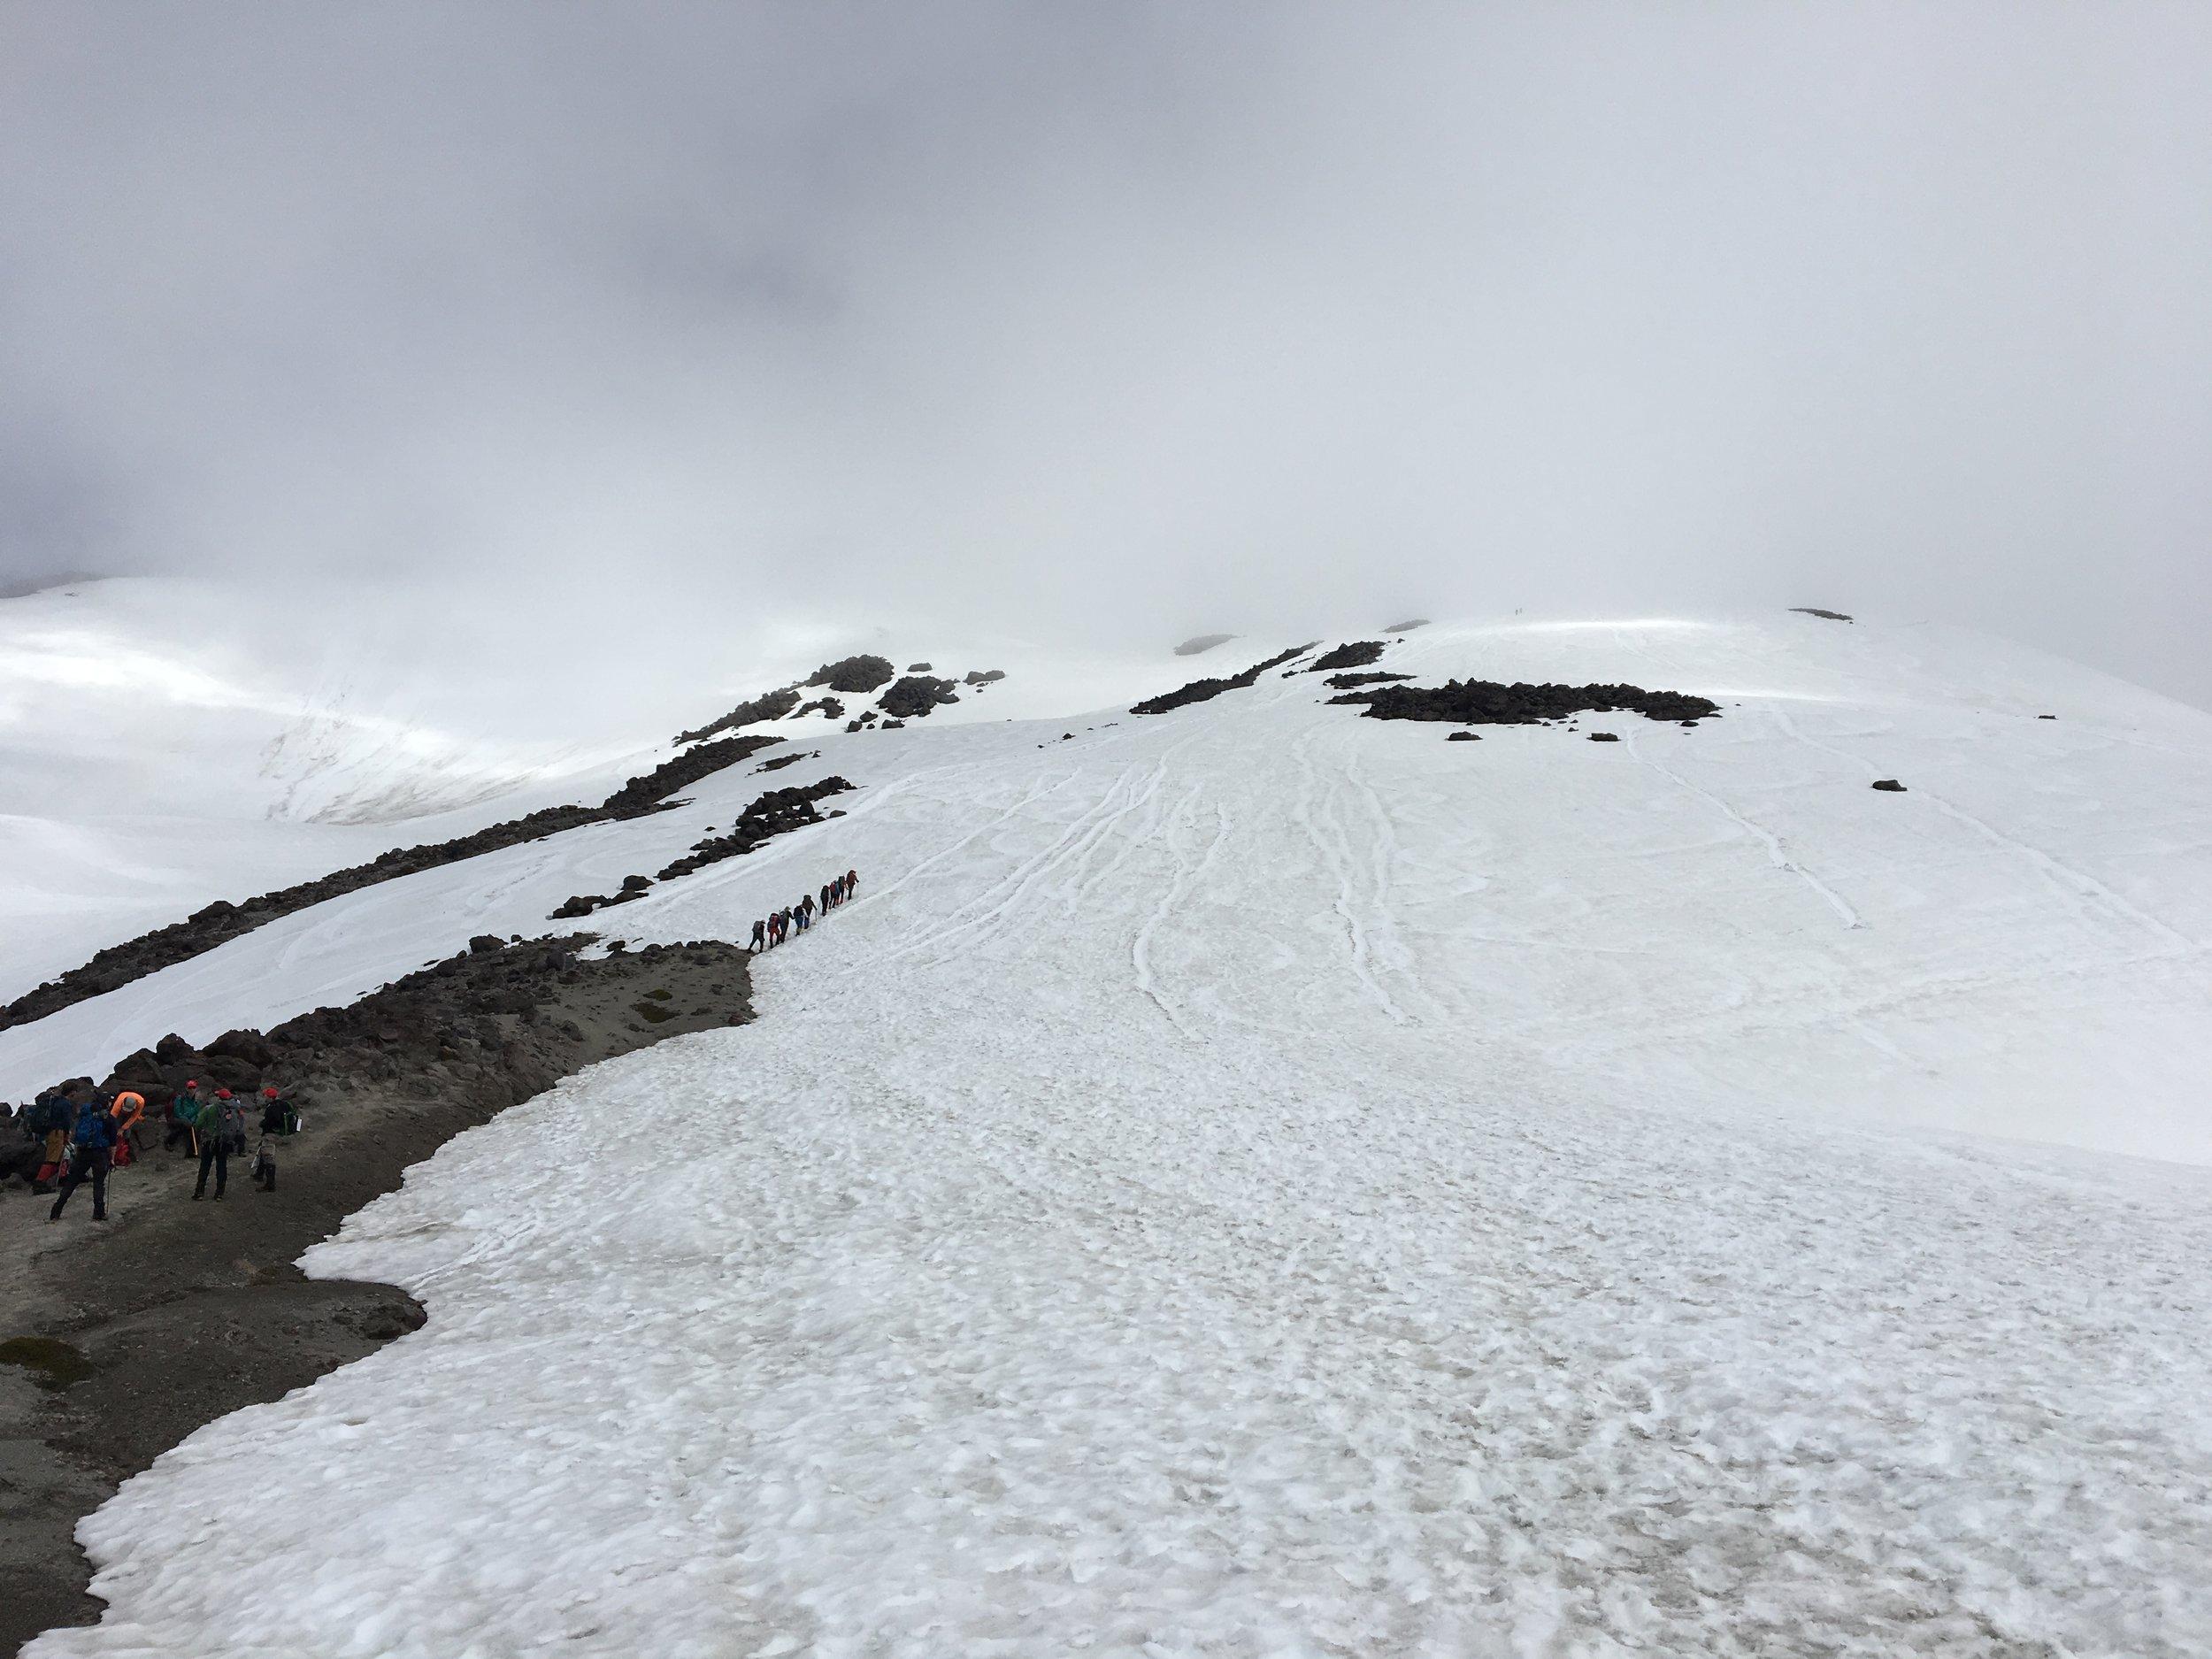 2017-06-04 Mt. St. Helens 018.JPG